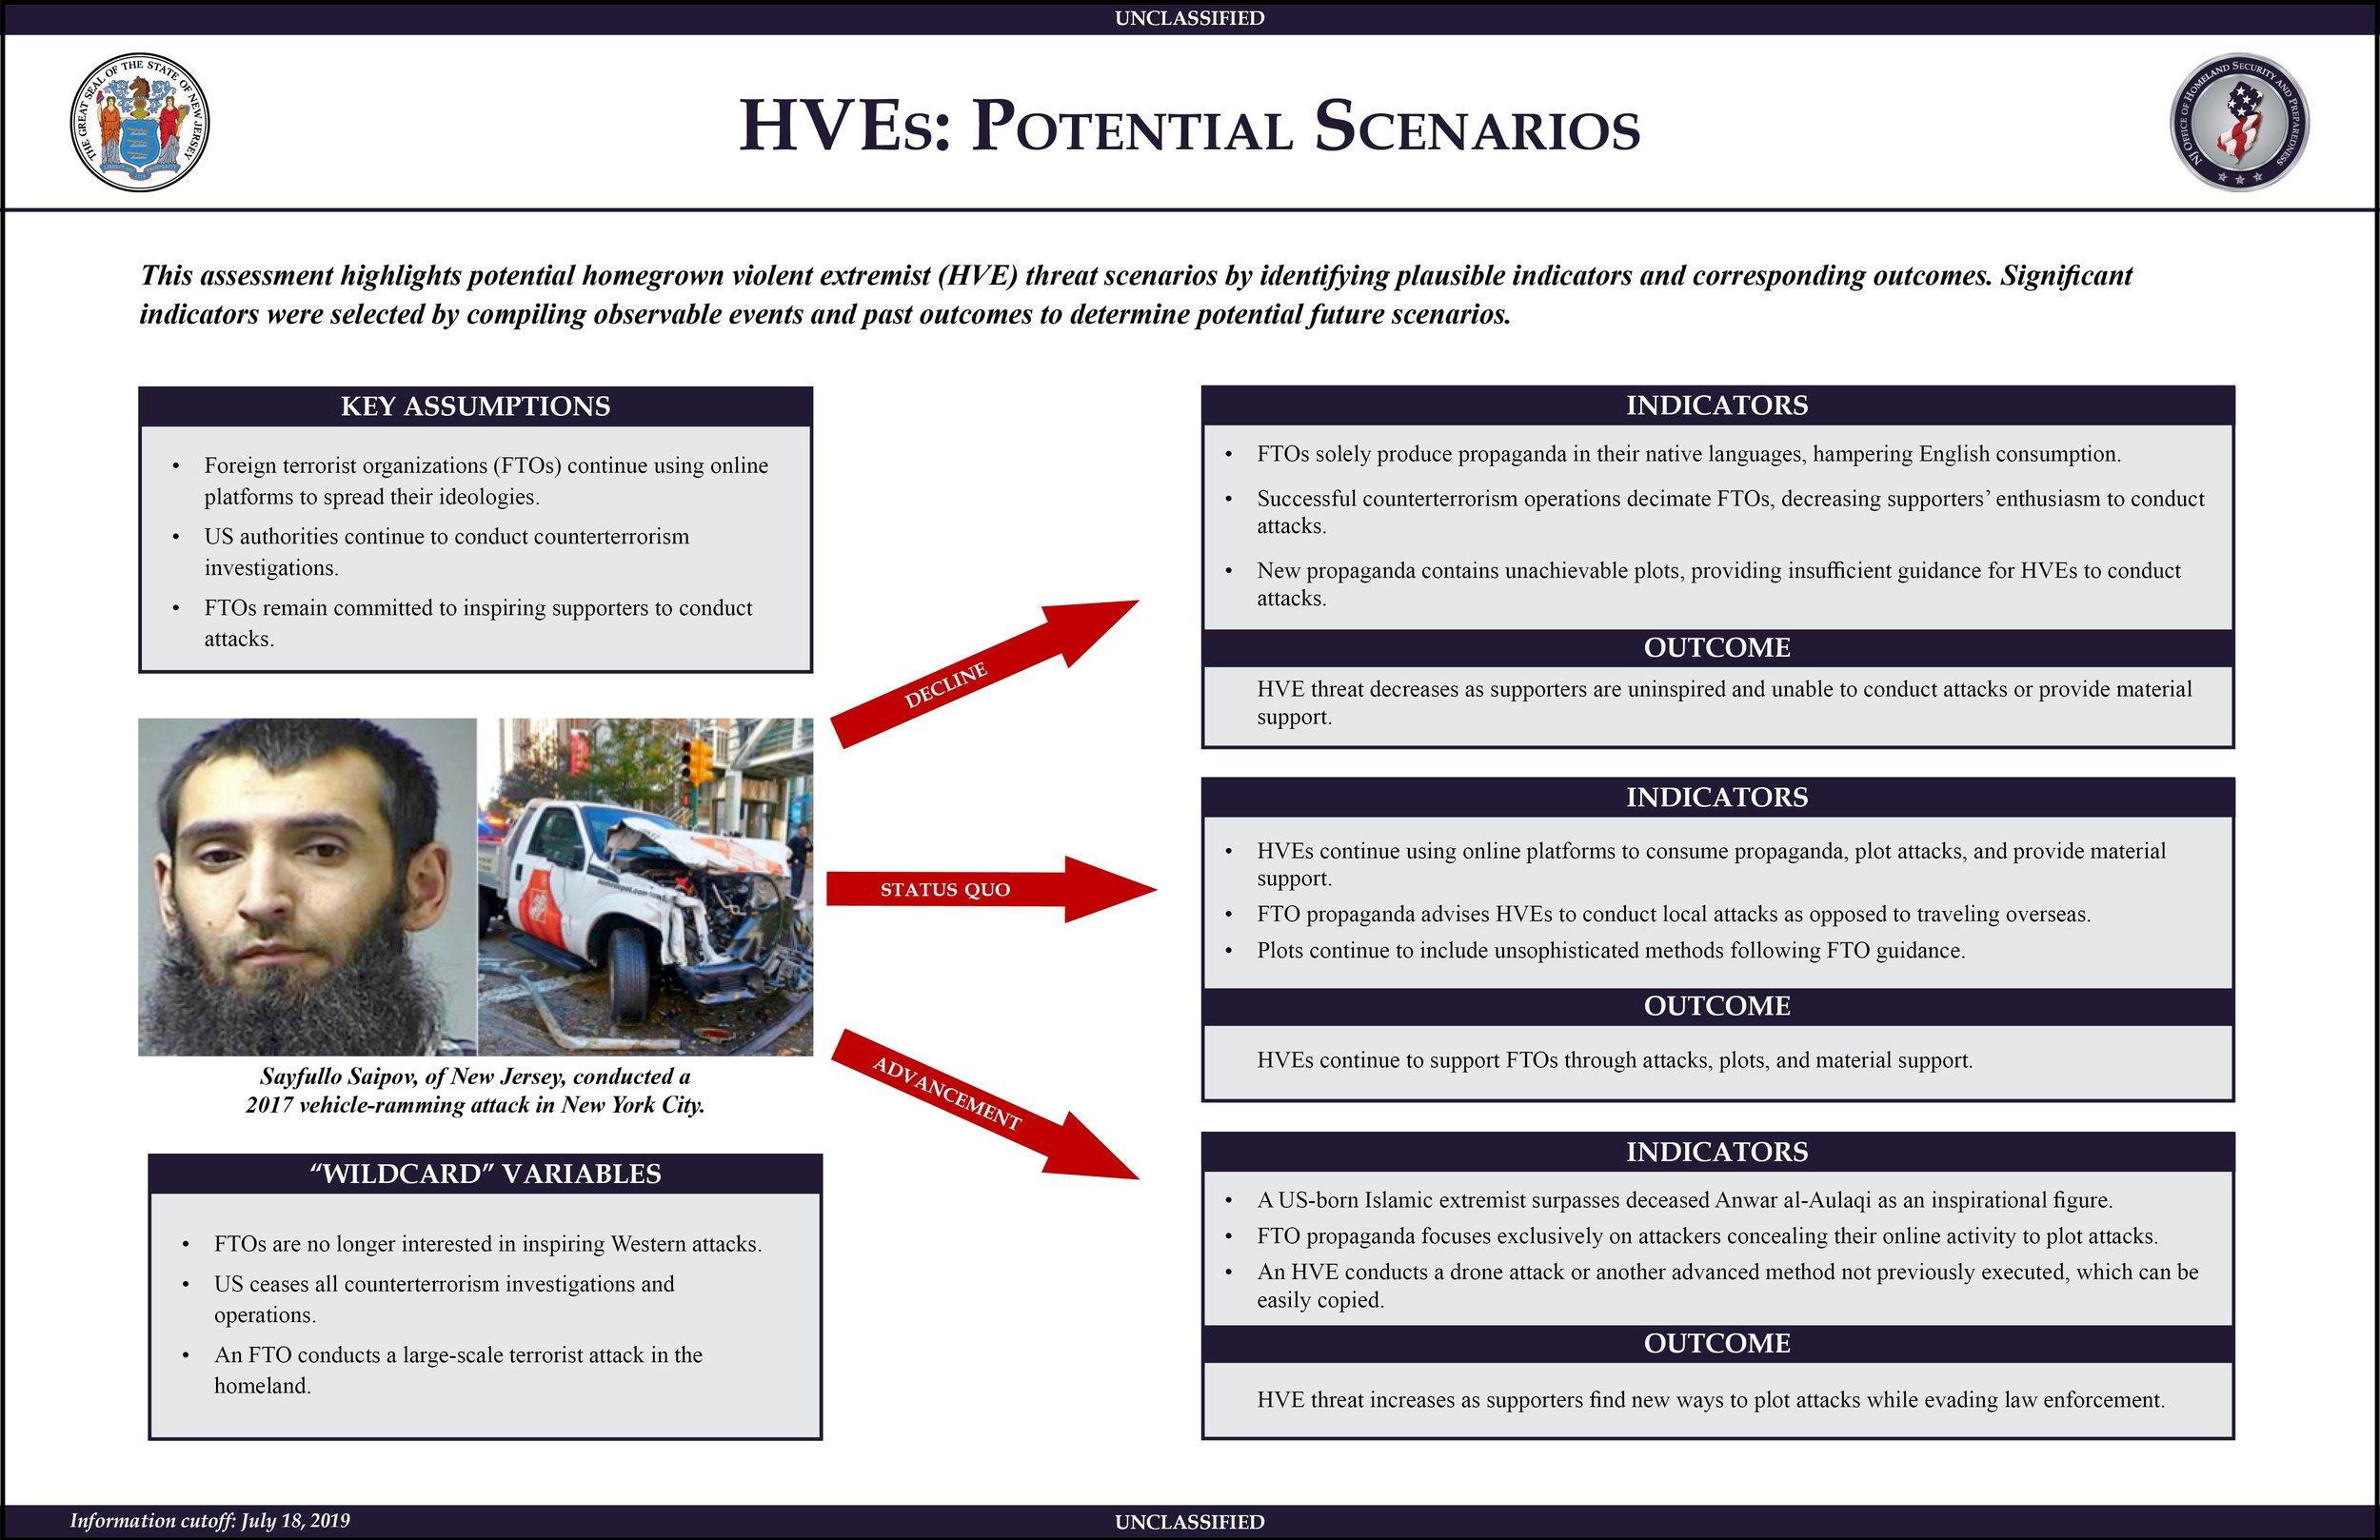 HVEs Potential Scenarios.jpg